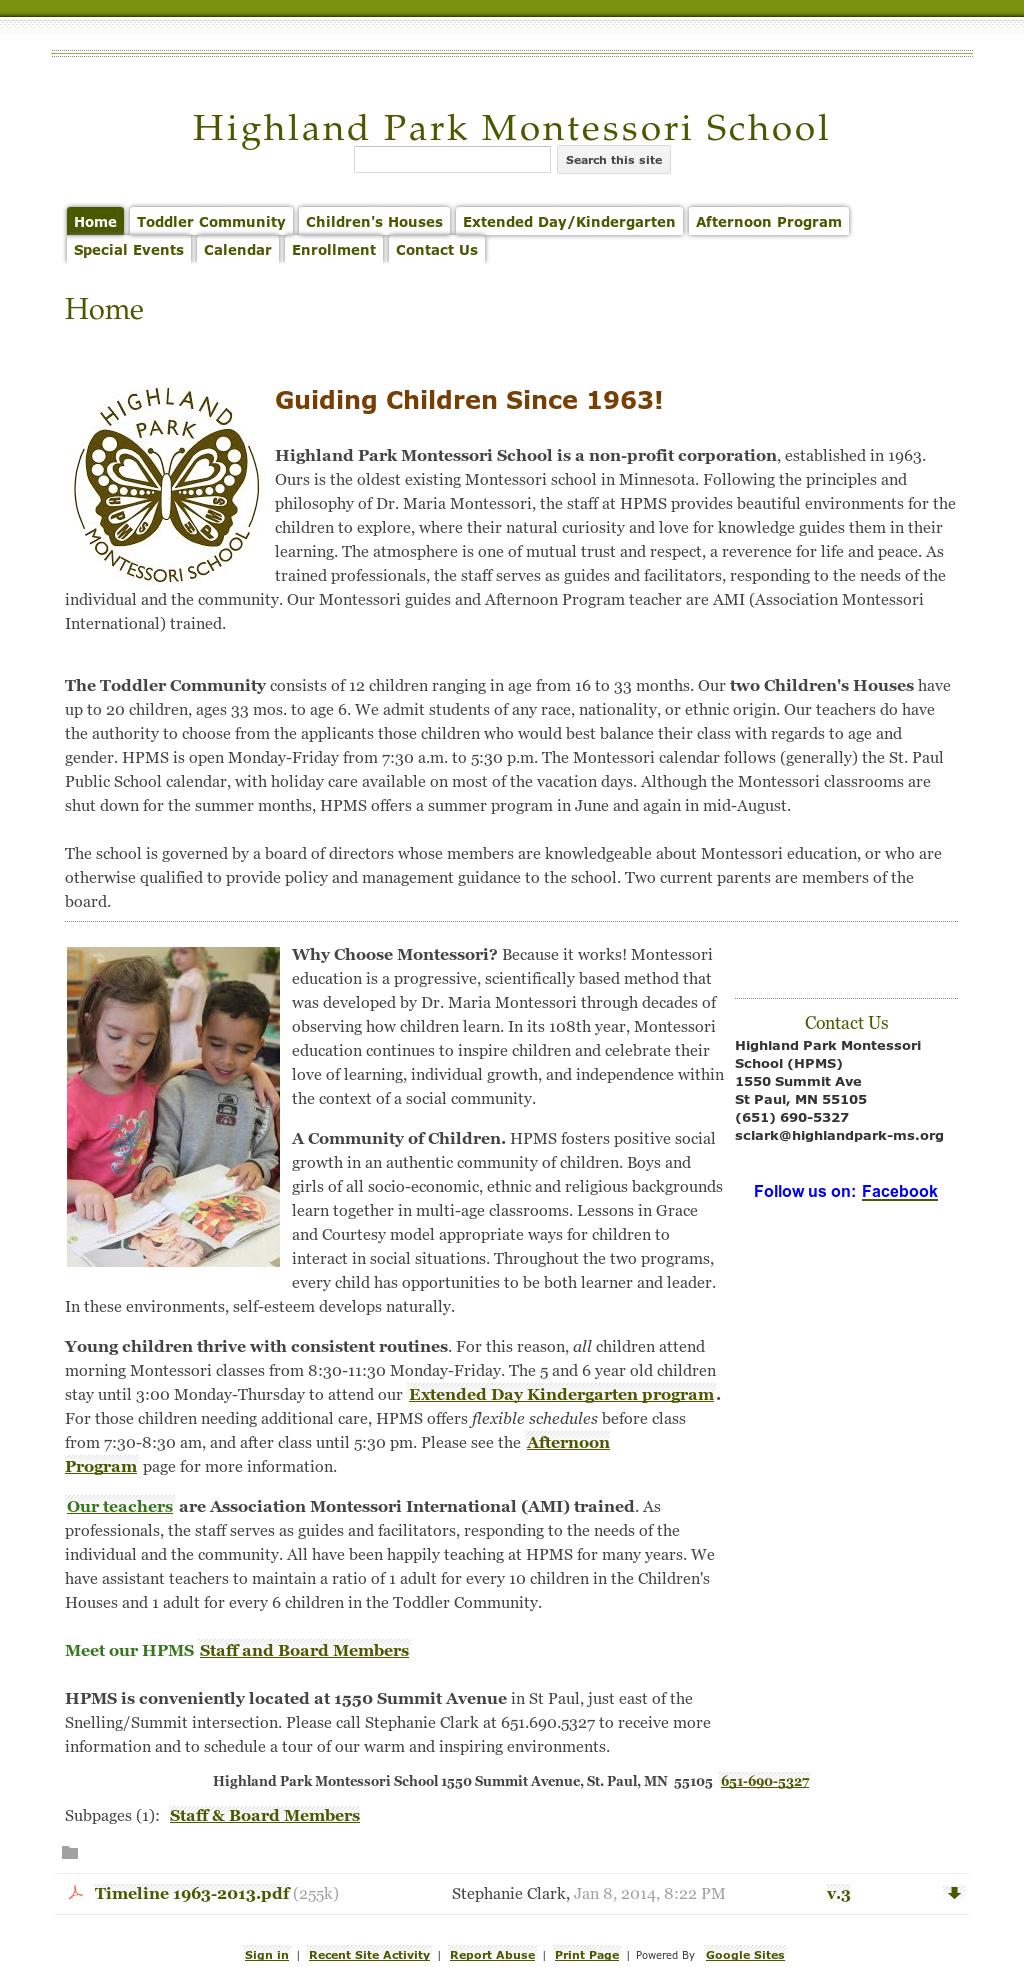 Highland Park Montessori School - Hpms Competitors, Revenue